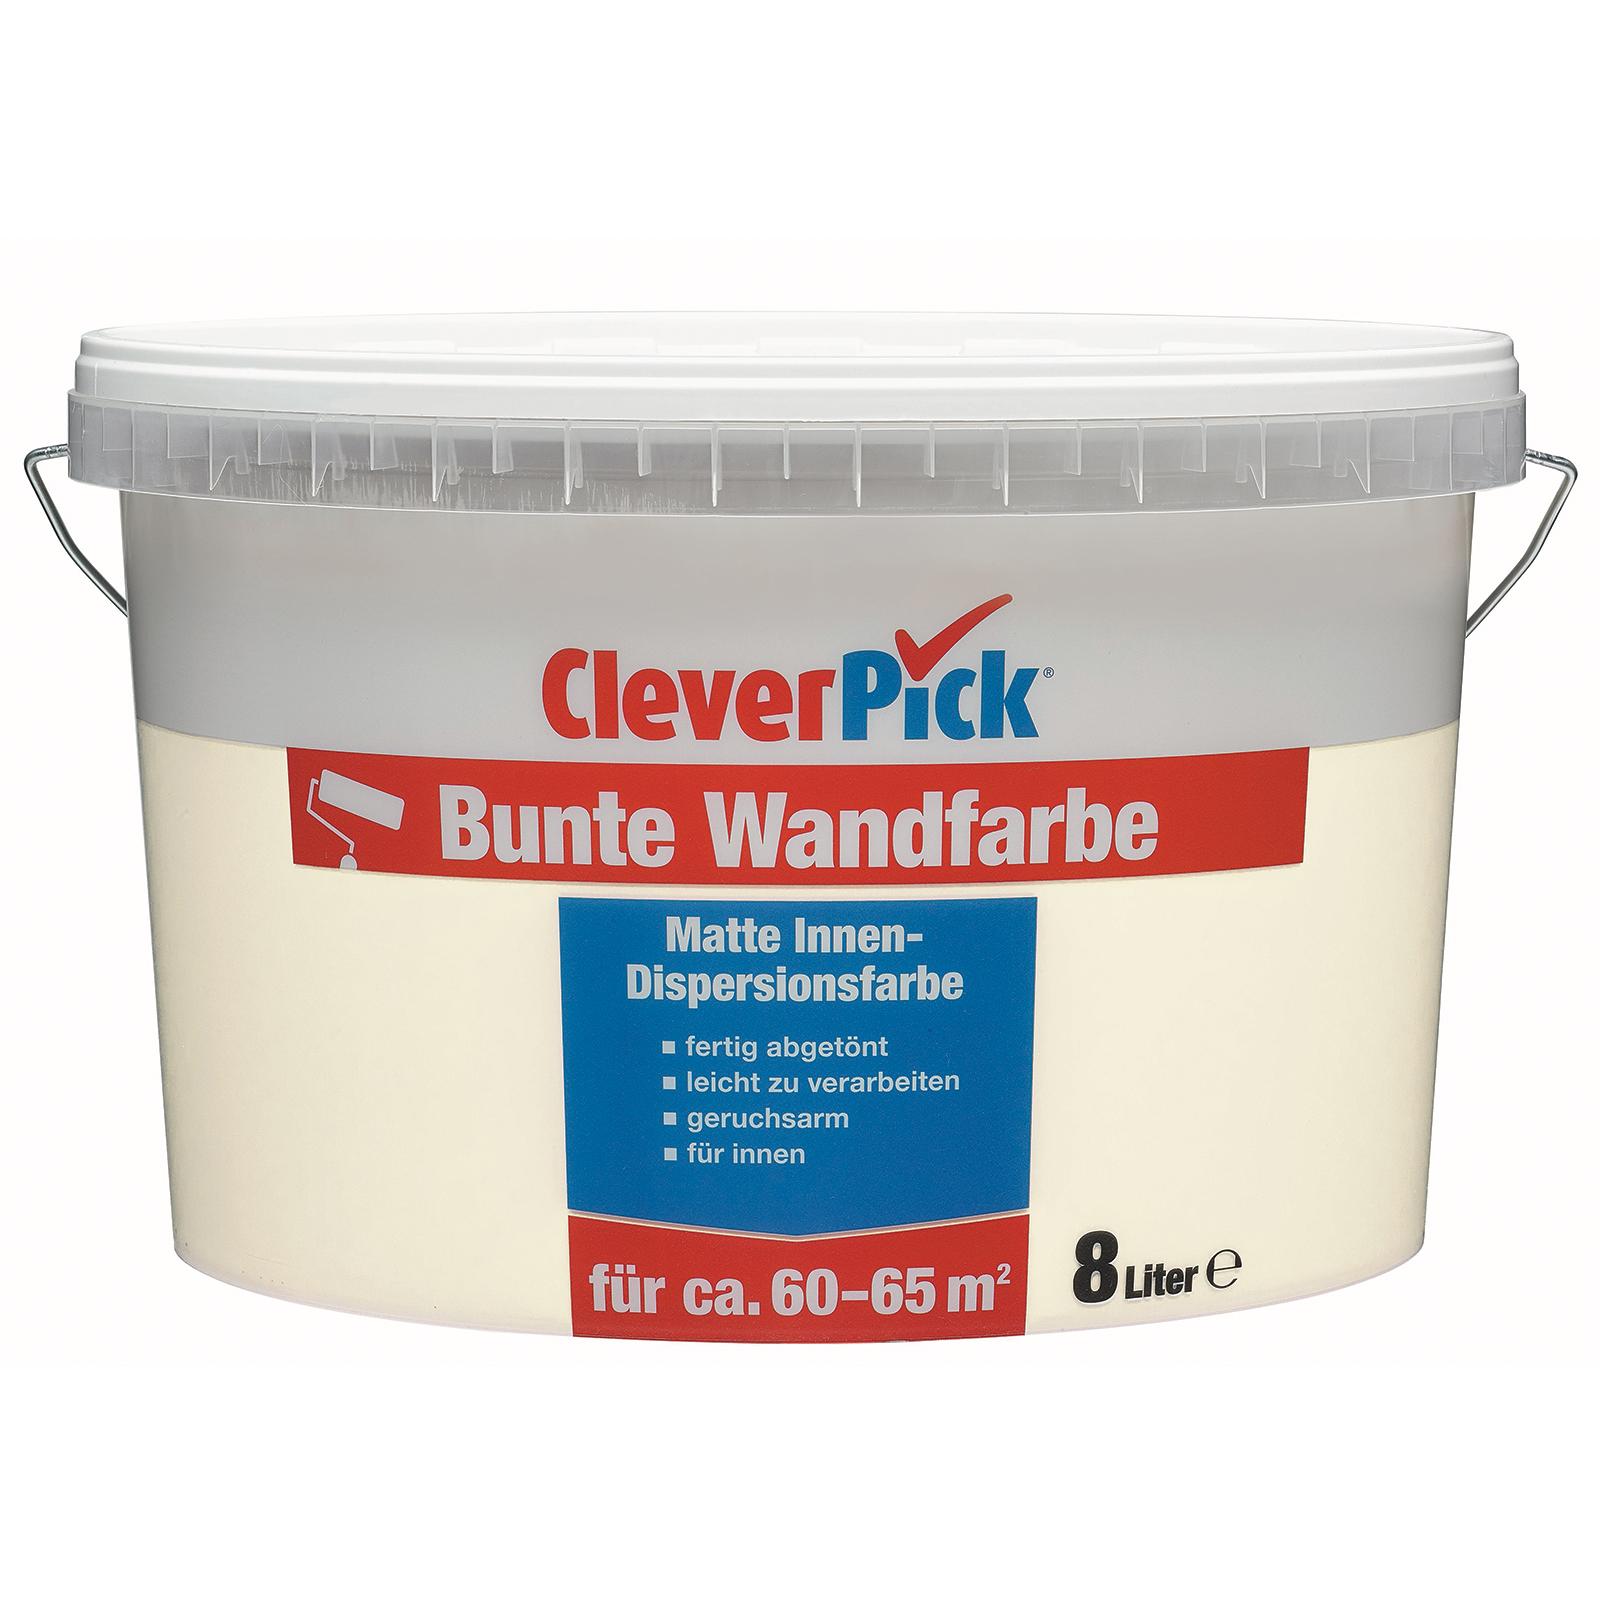 CleverPick Bunte Wandfarbe - Vanille - 8 Liter